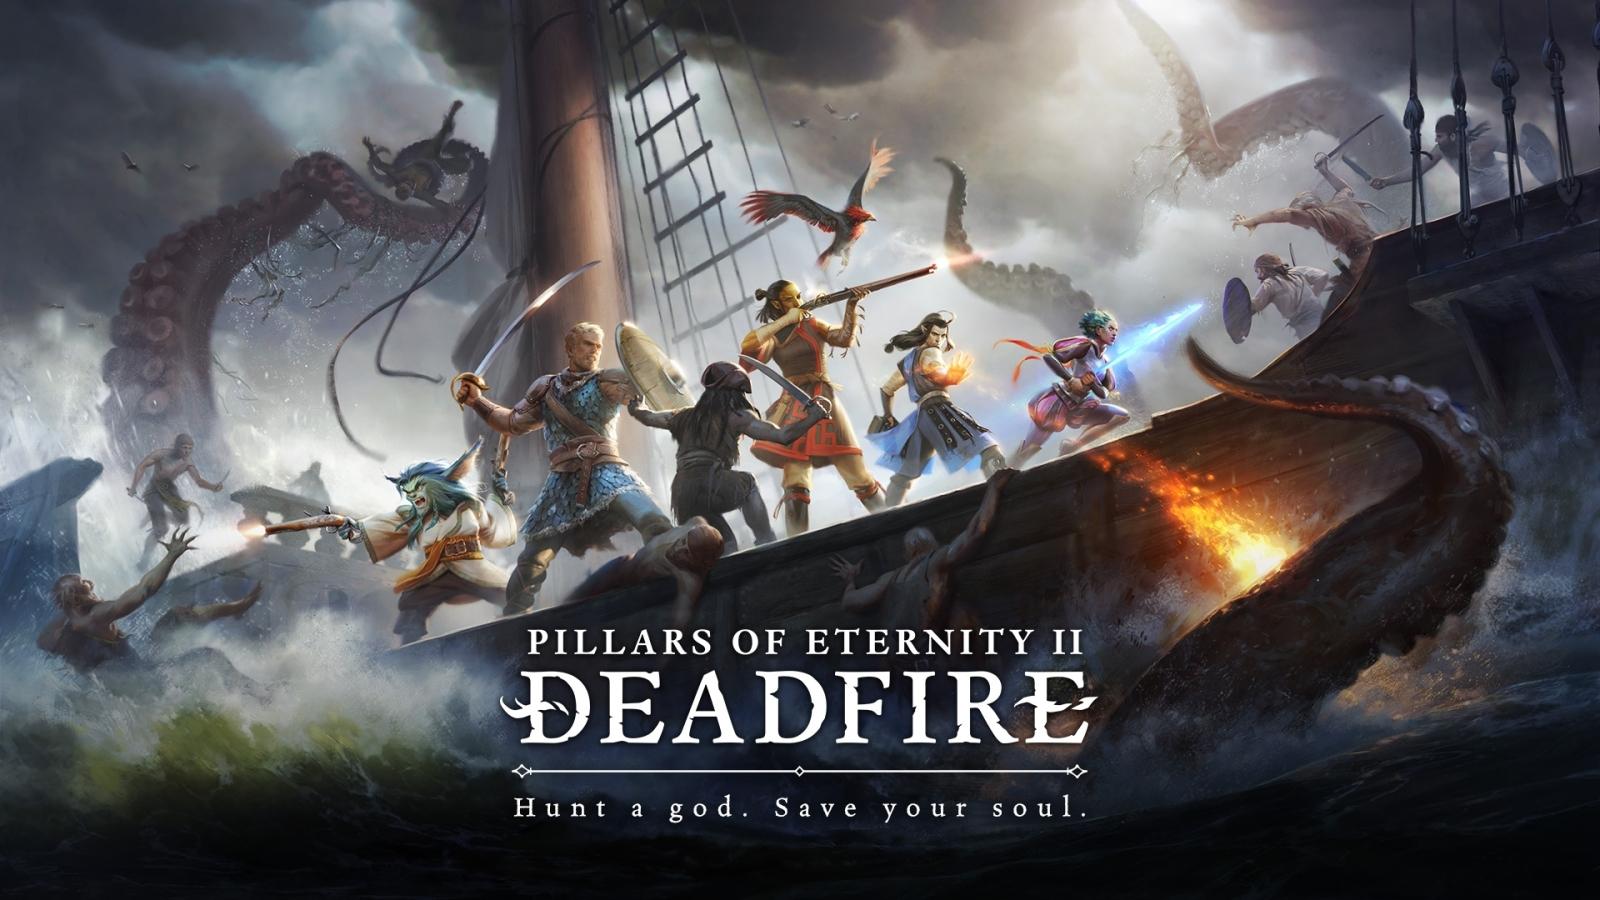 Pillars of Eternity II: Deadfire выйдет на PS4 и Xbox One 28 января action,mmorpg,pillars of eternity ii: deadfire,ps,xbox,Игровые новости,Игры